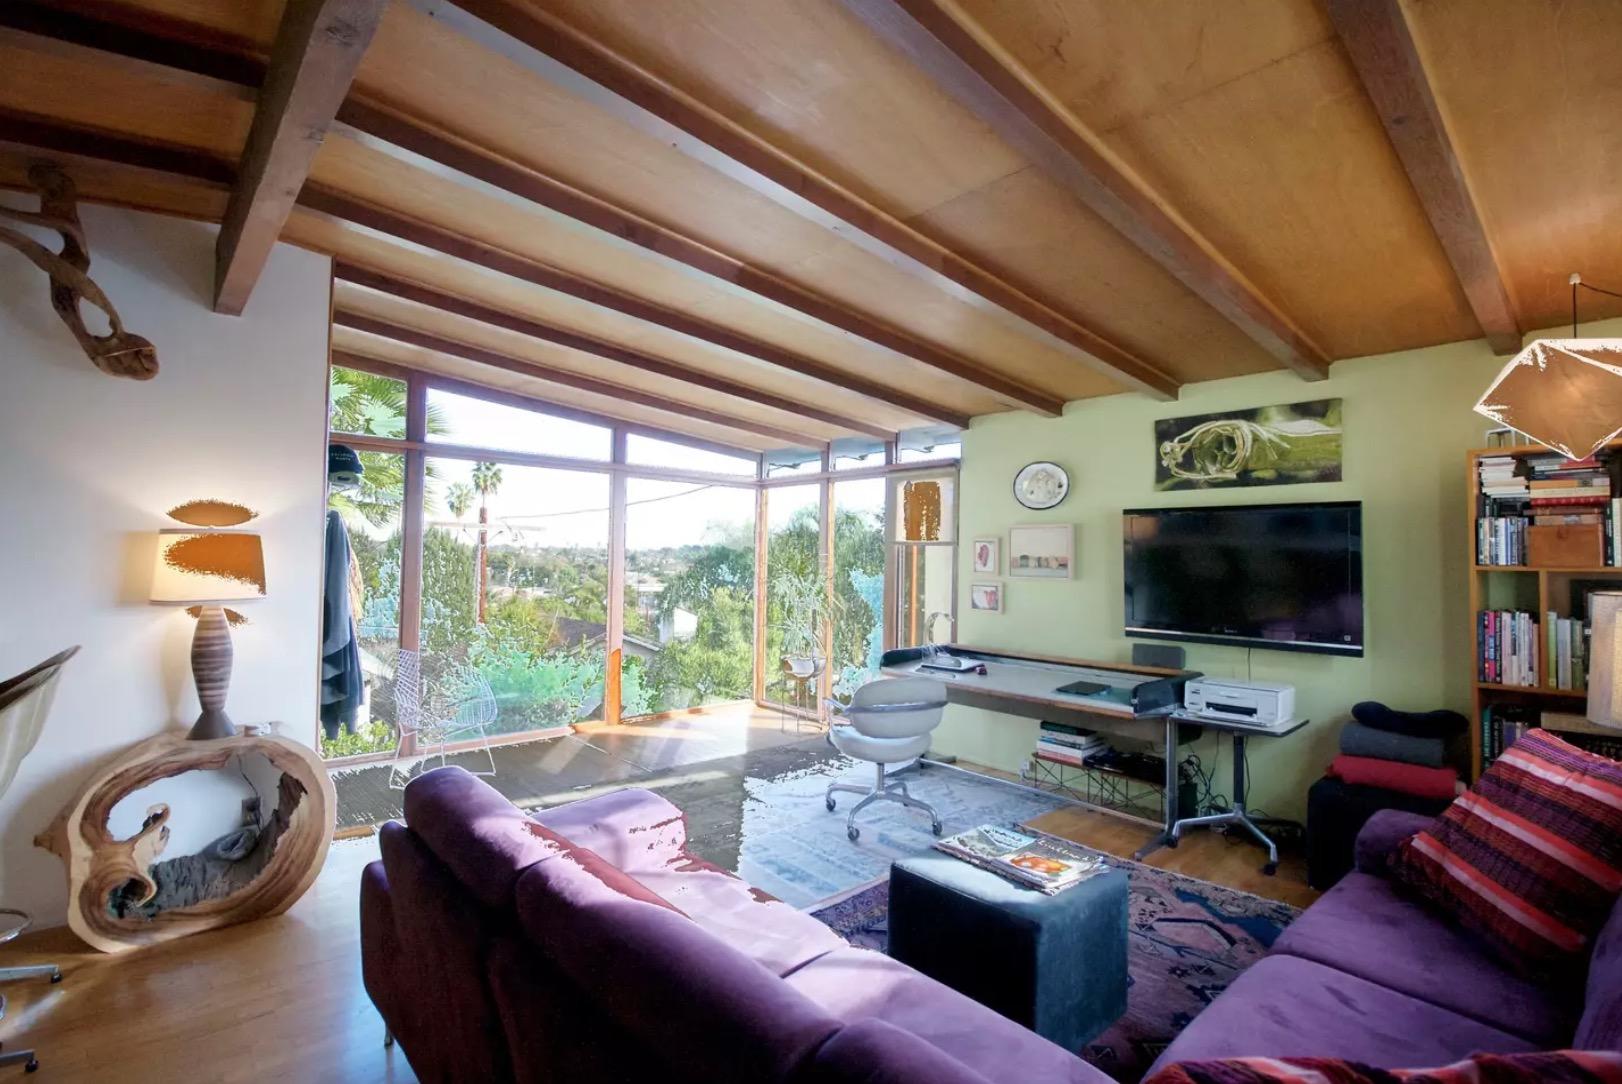 highland-park-airbnb-2-bedroom.jpg